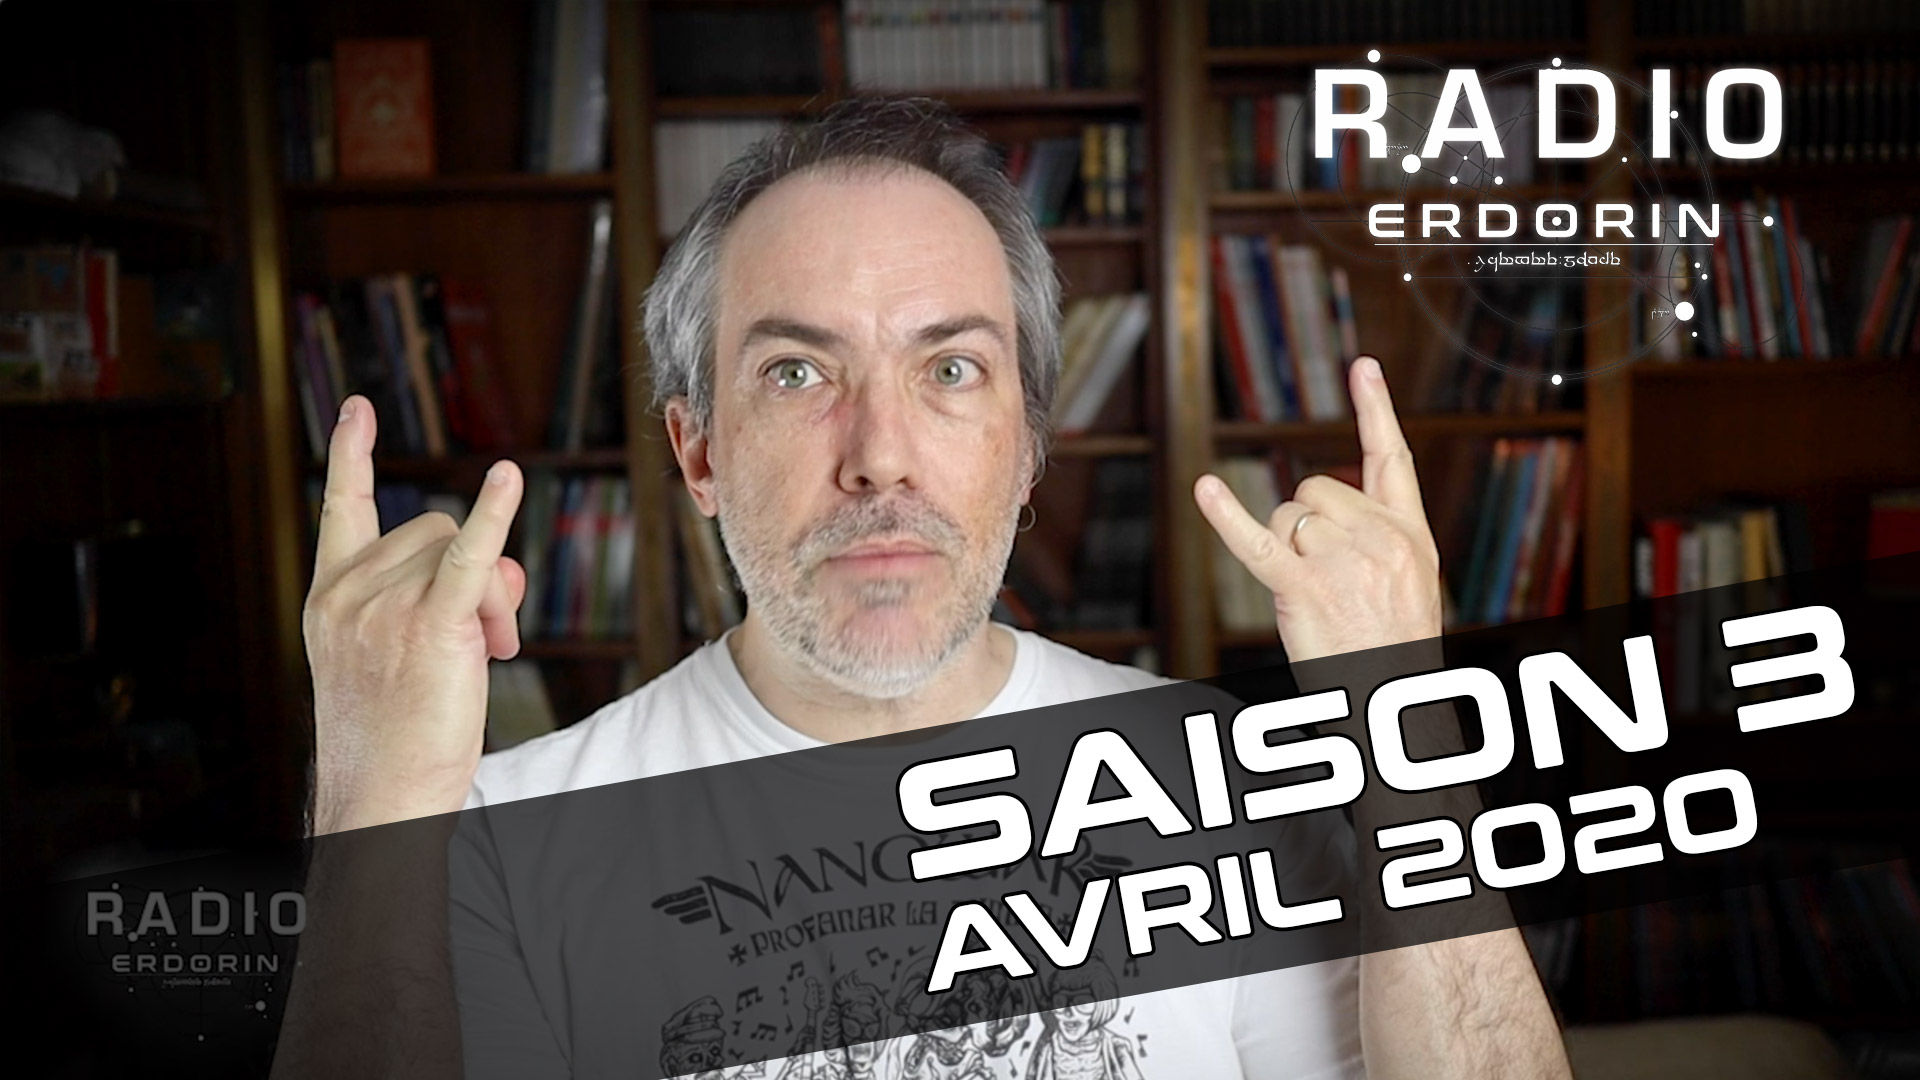 Radio-Erdorin S3E4: Avril 2020